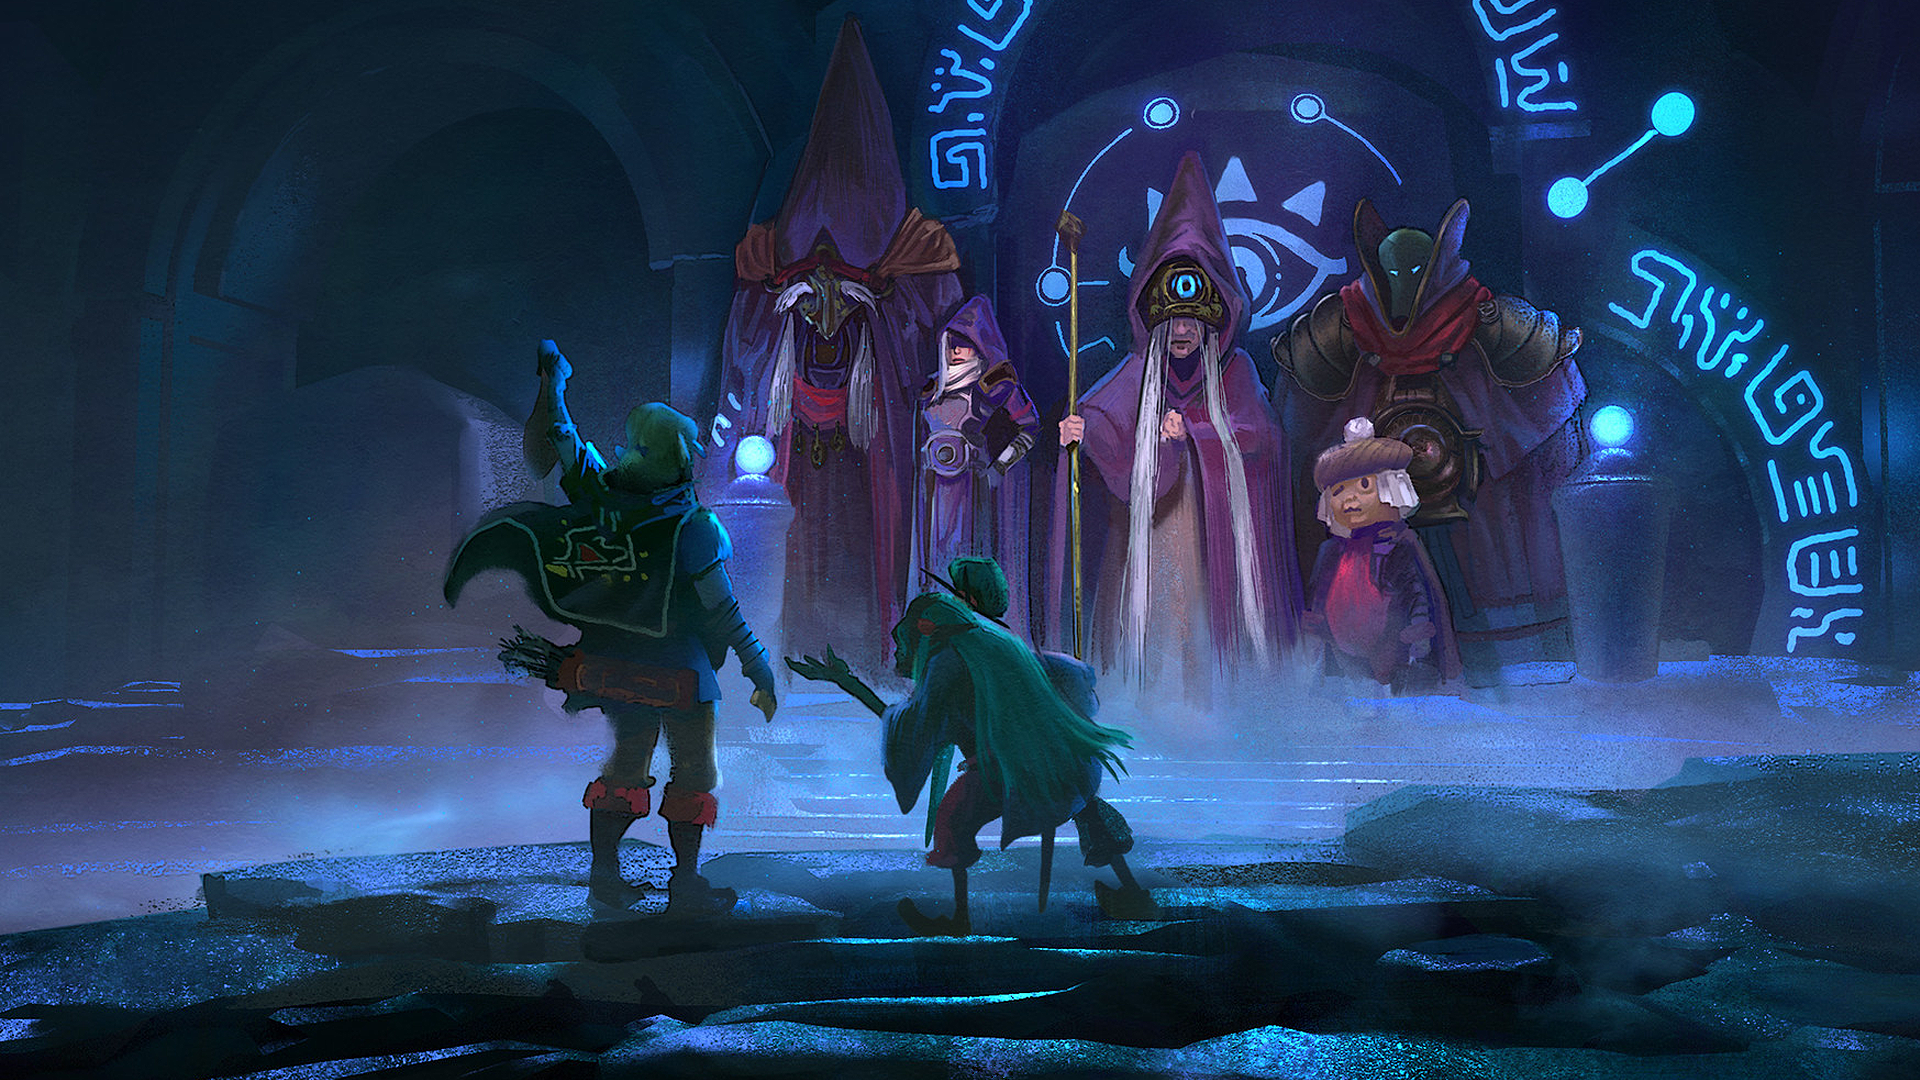 General 1920x1080 Tyler Edlin digital art artwork The Legend of Zelda: Breath of the Wild Link video game art fantasy art video game characters cave